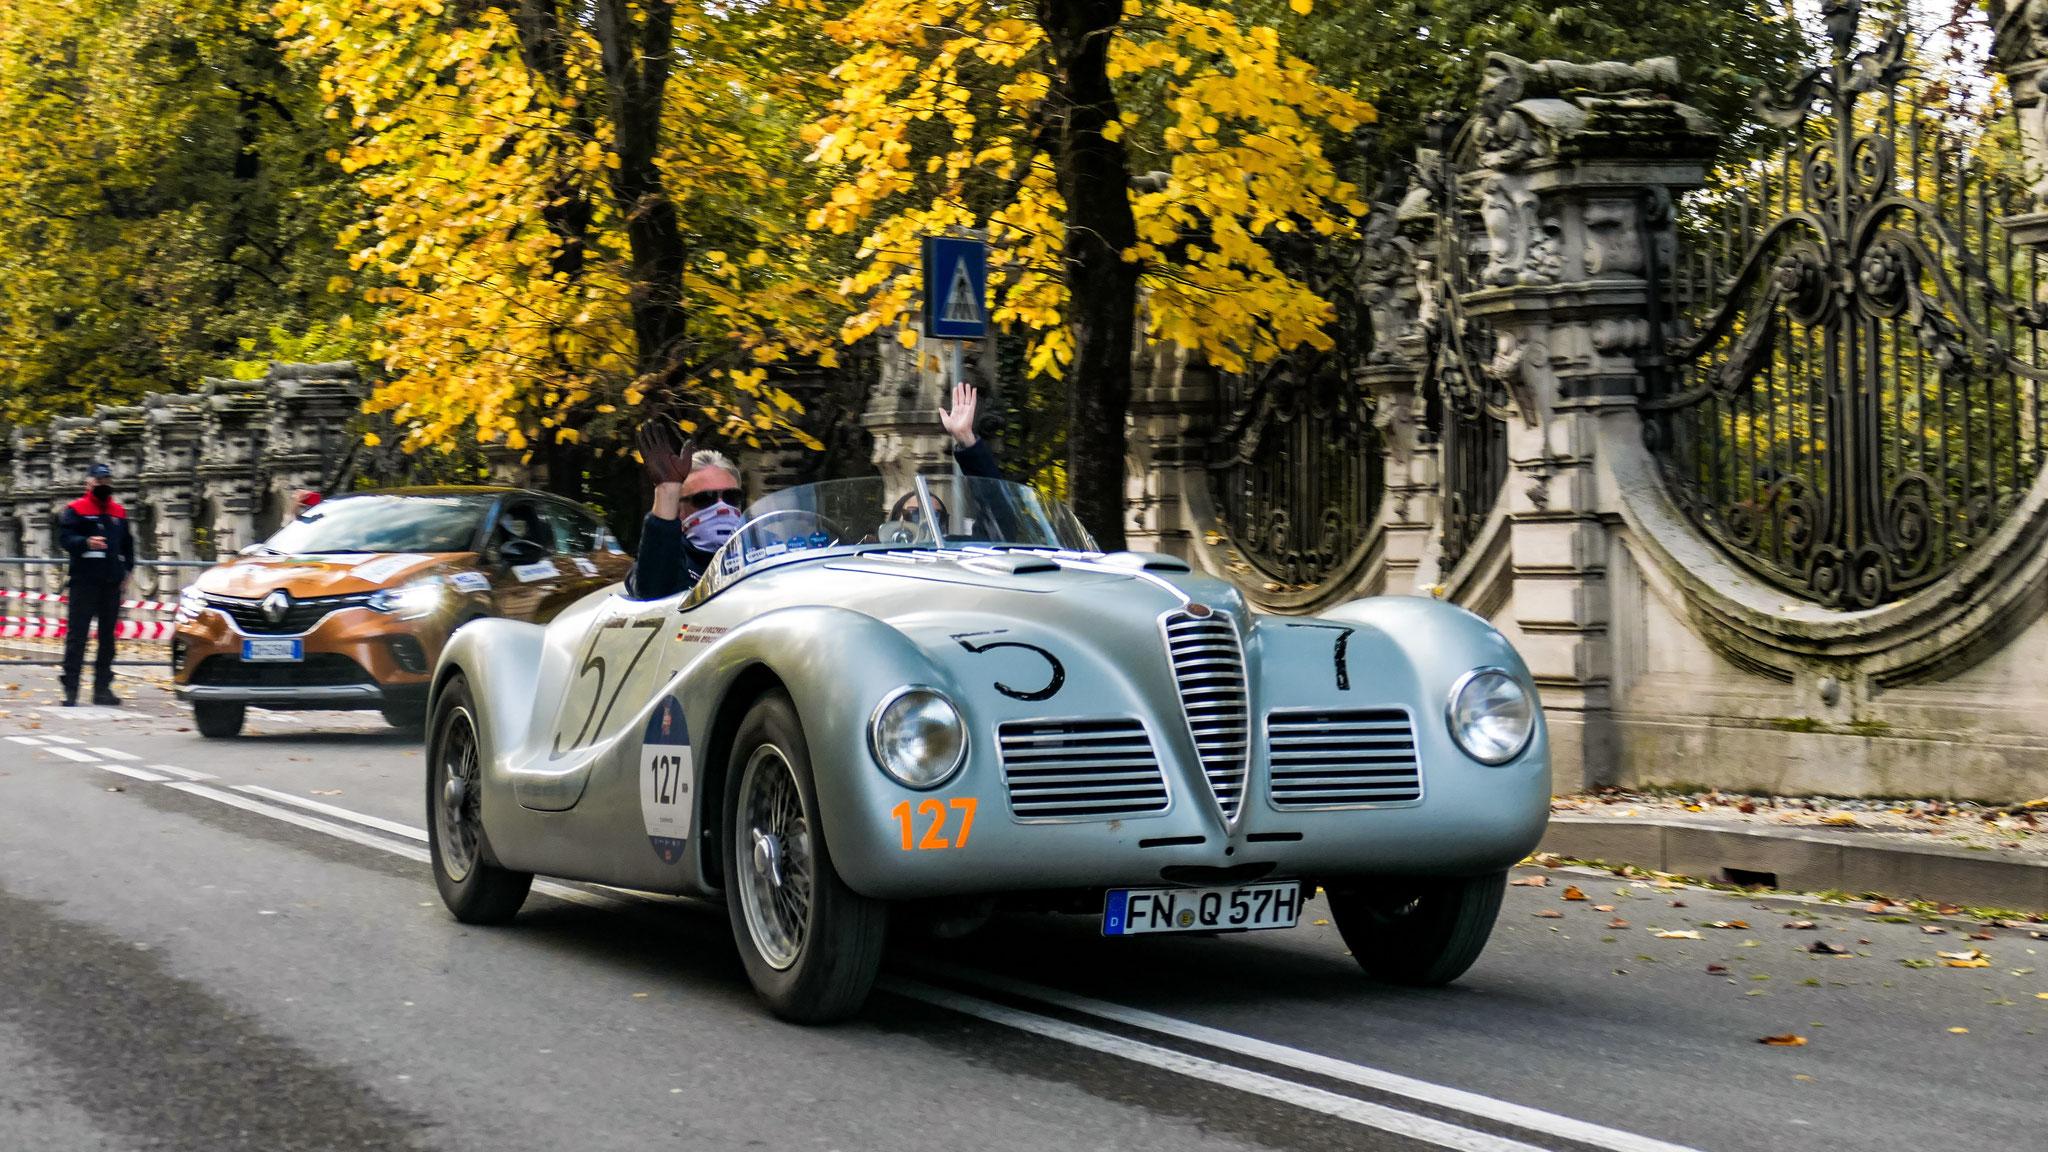 Alfa Romeo 6C 2500 Super Sport Competizione - FN-Q-57H